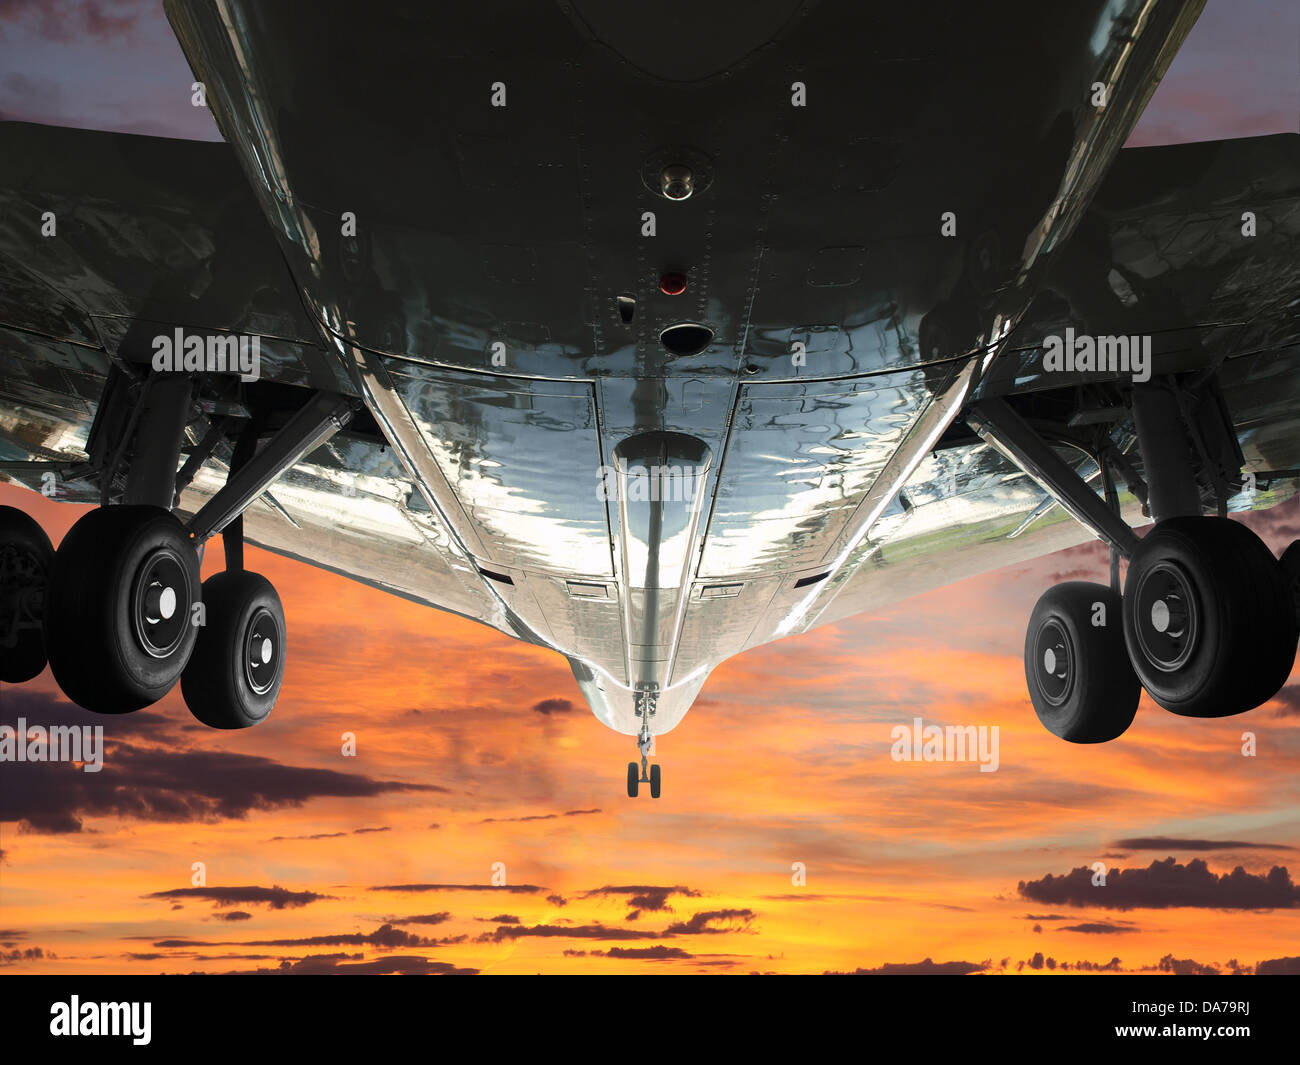 Jet lifting off into a sunrise sky. - Stock Image